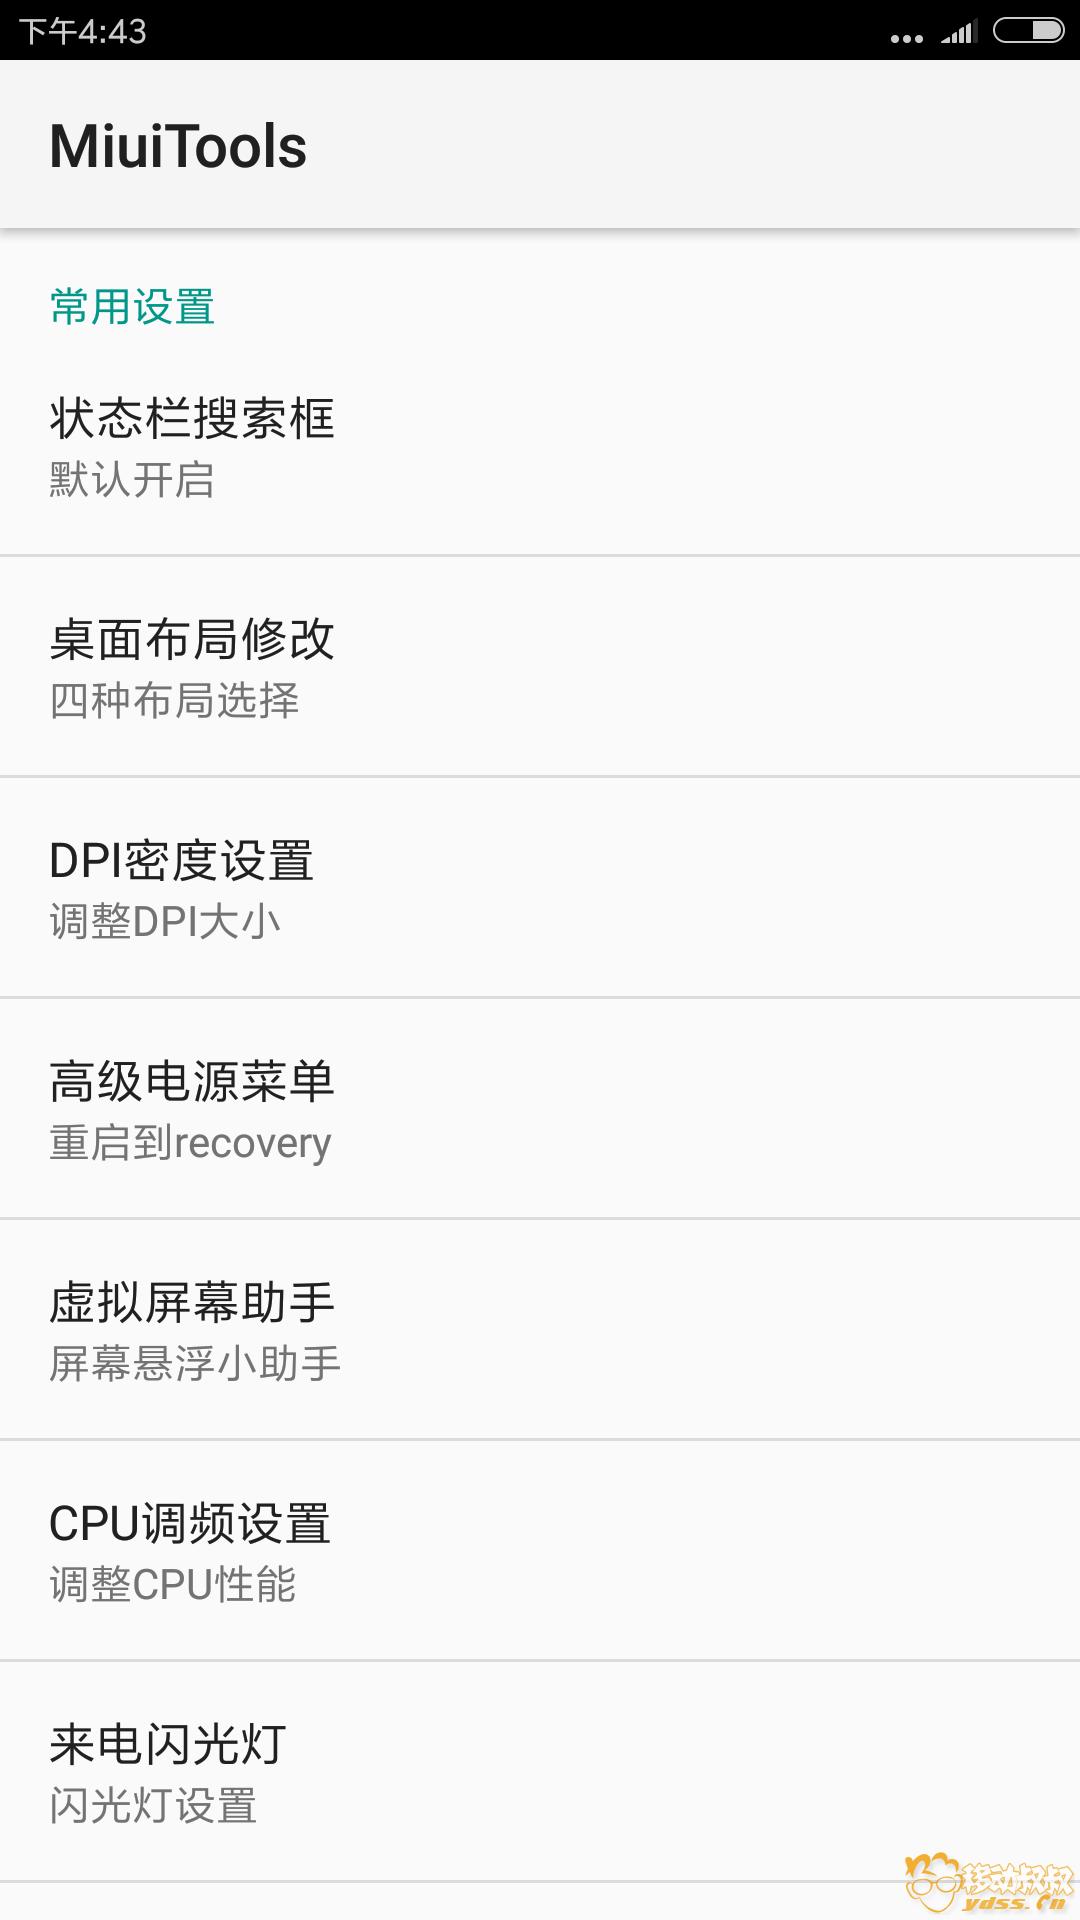 Screenshot_2018-04-06-16-43-51-694_com.anzhi.hwsettings.png